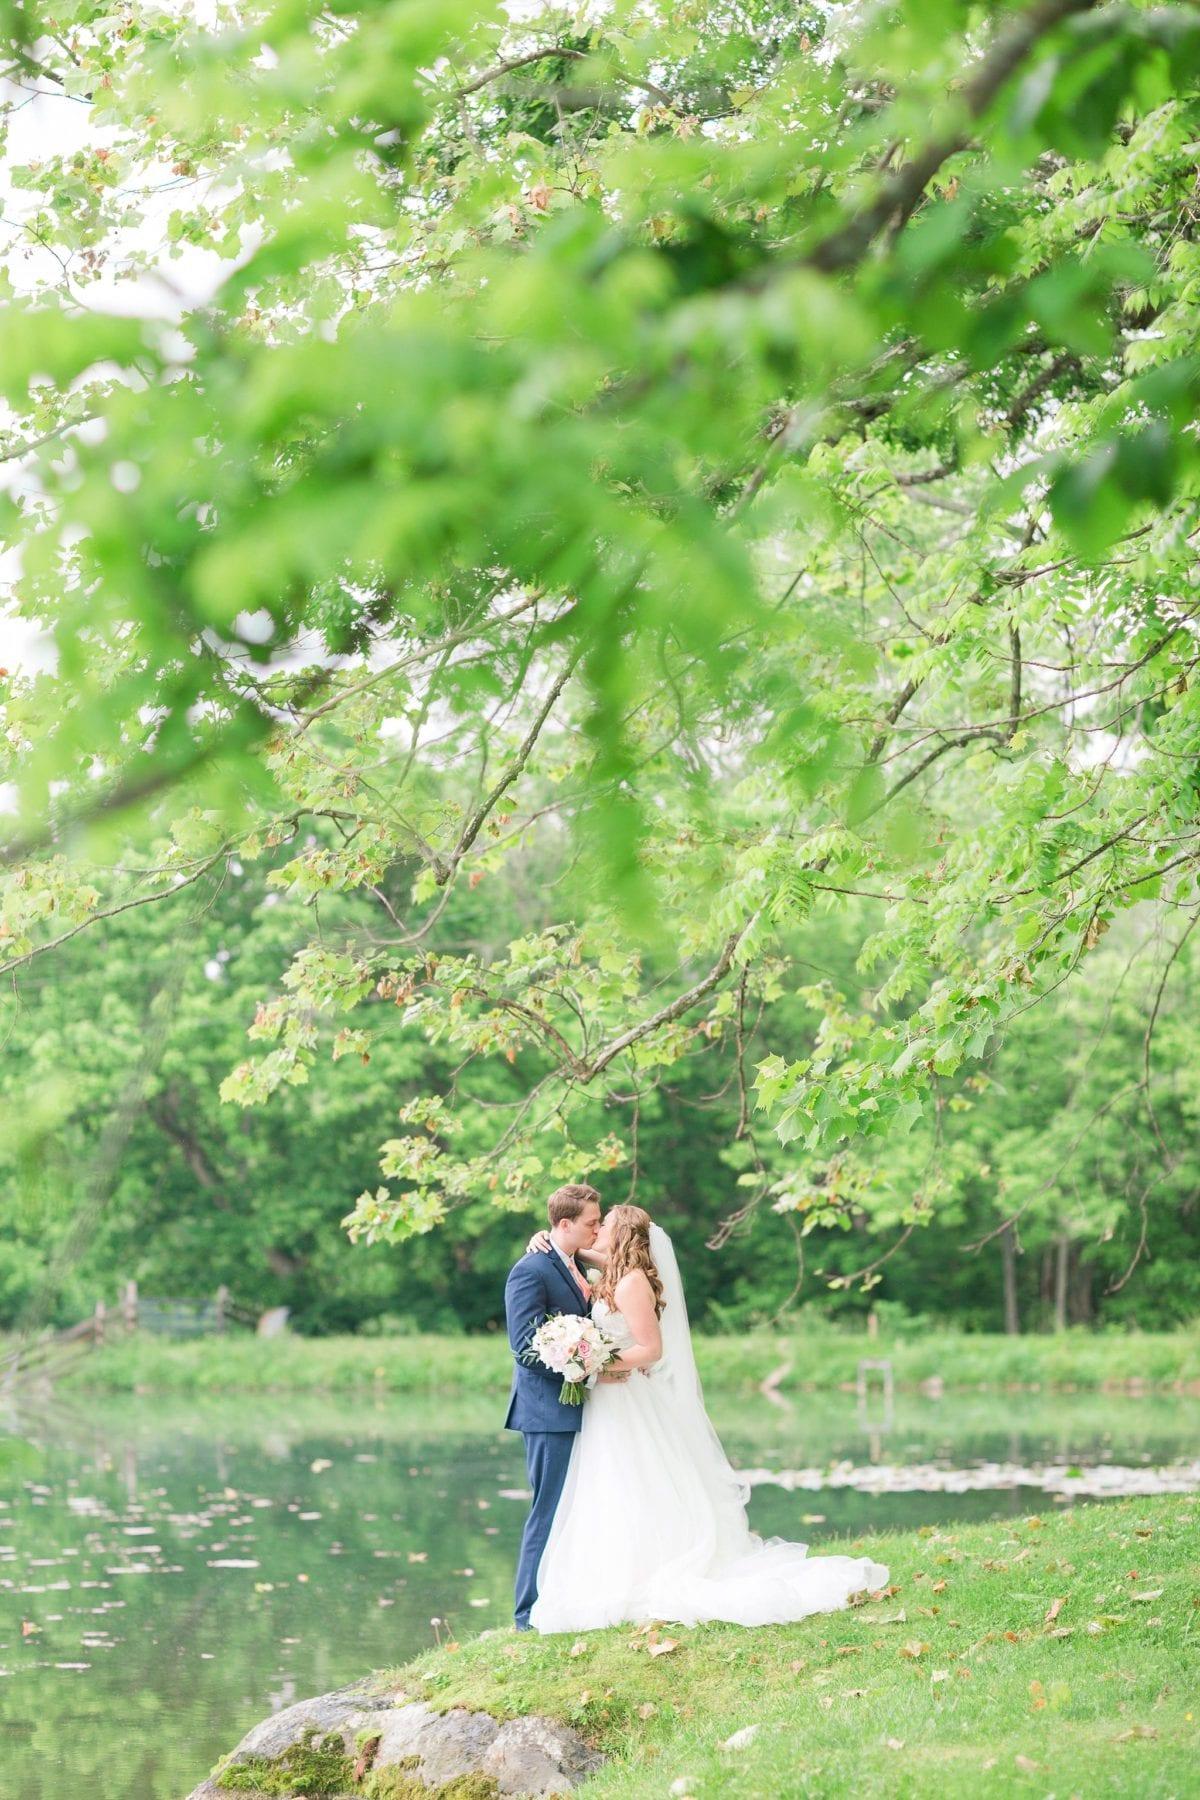 Justin & Megan Big Spring Farm Wedding Photos-197.jpg